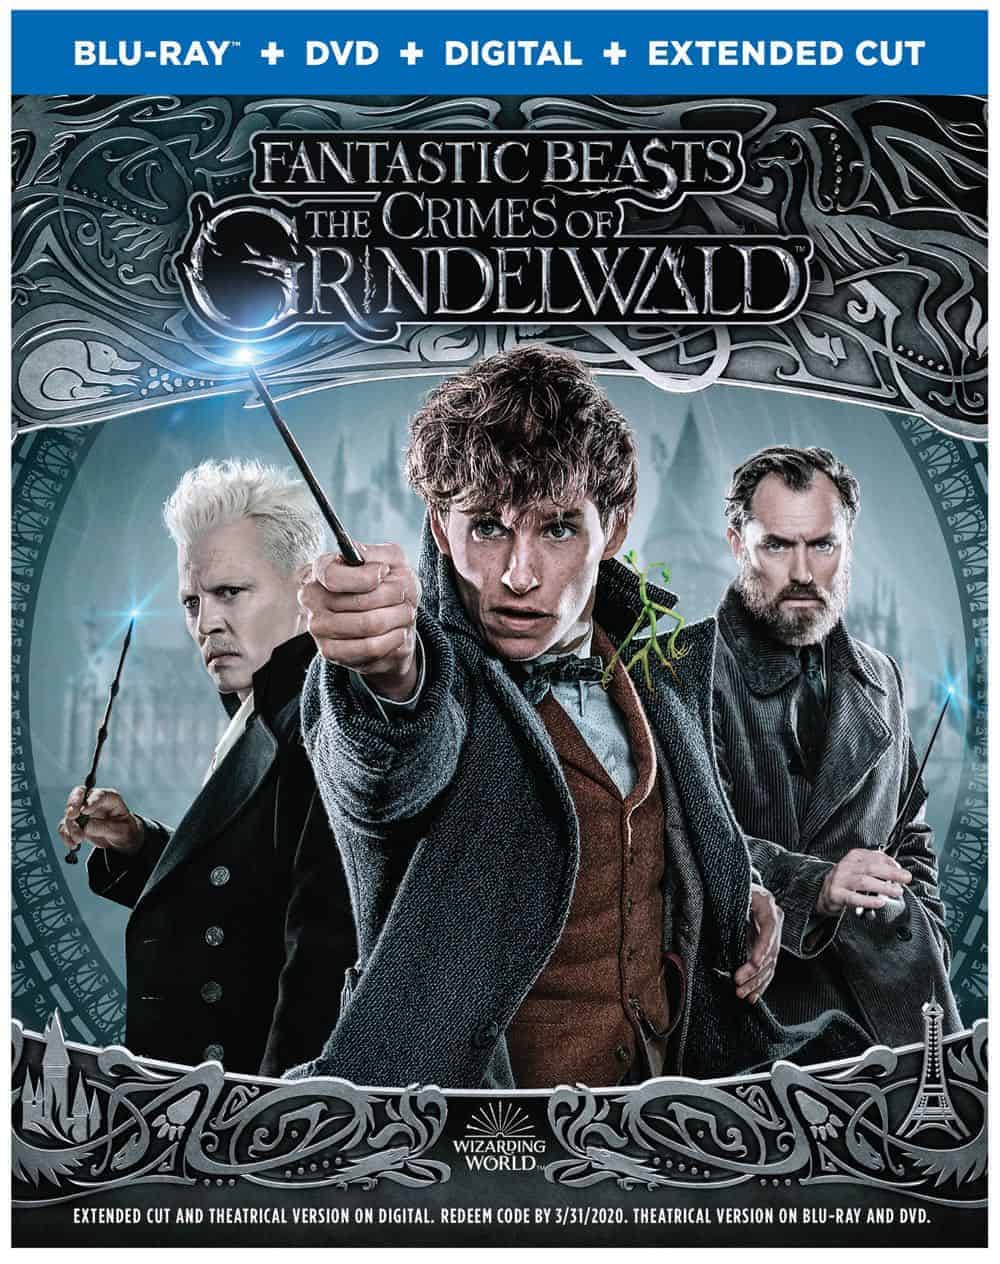 Fantastic Beasts The Crimes of Grindelwald 4K Bluray DVD Digital 3